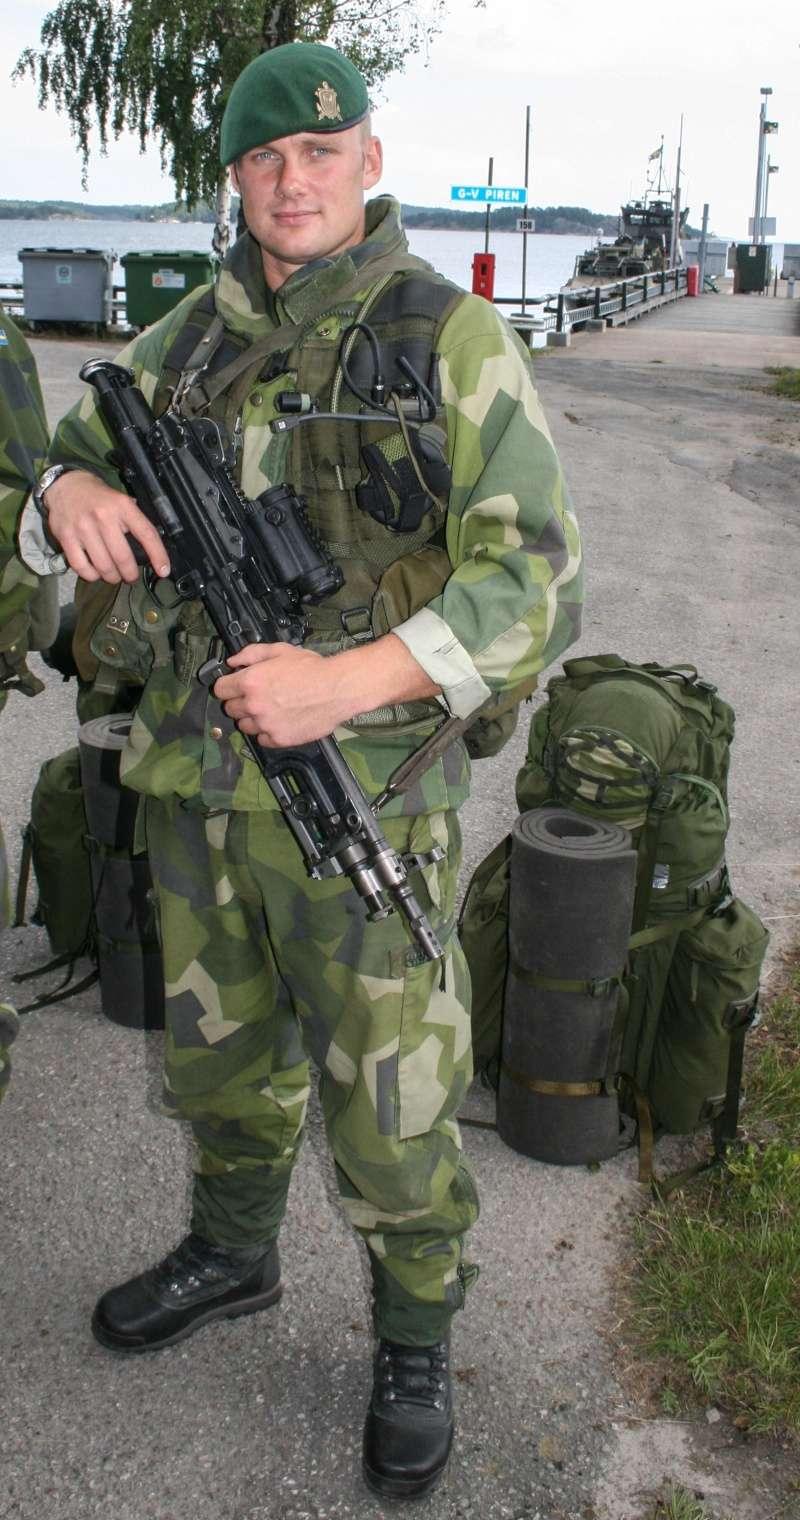 L'influence du camouflage allemand ww2, de nos jours. - Page 6 Soldie10